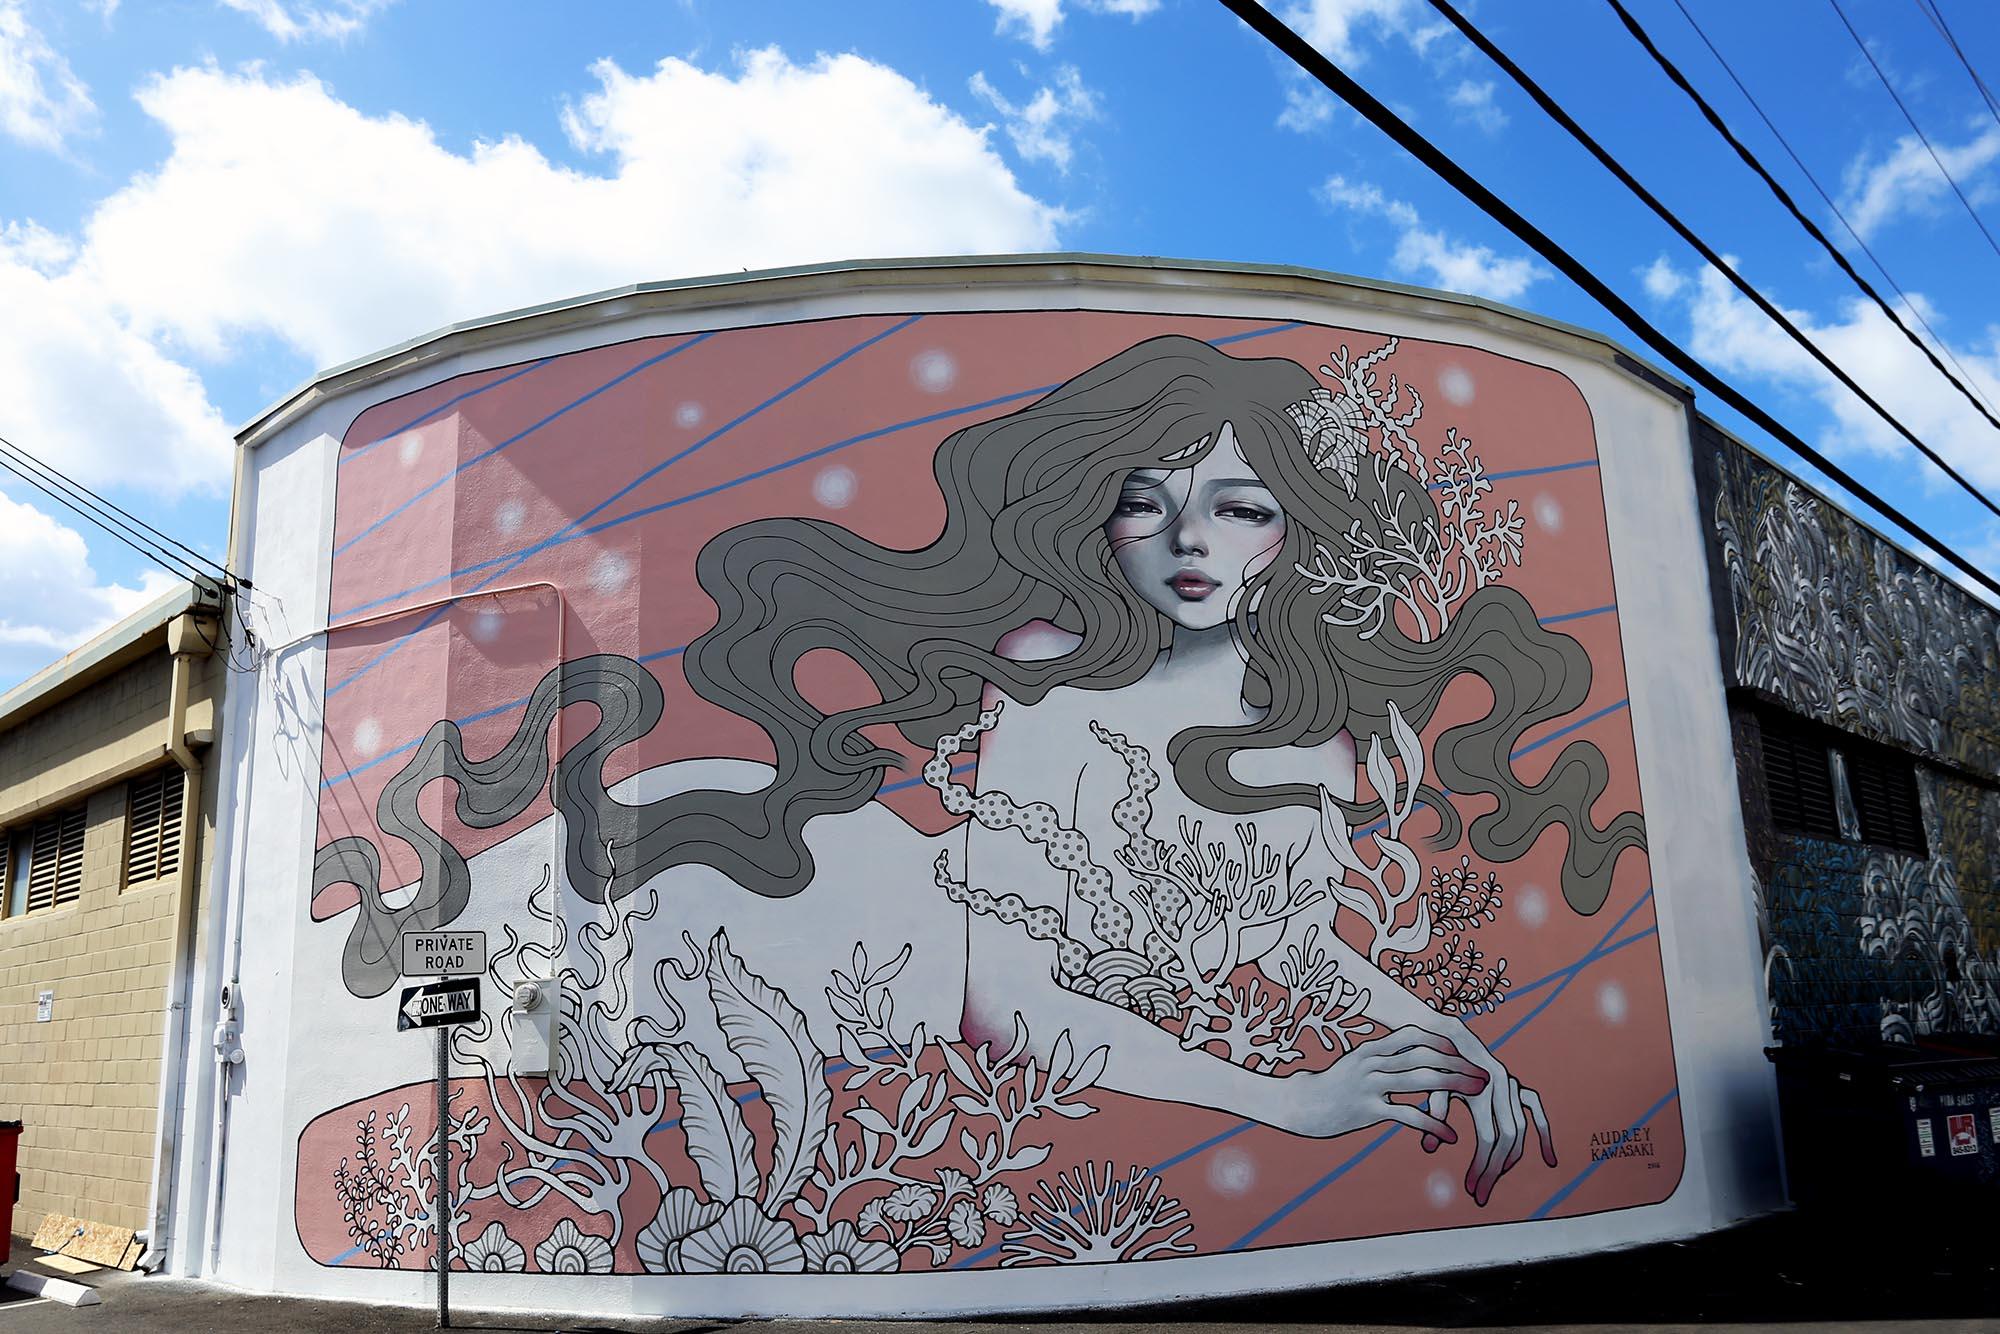 audrey_kawasaki_powwow-festival-grafite-mural-dionisio-arte (4)